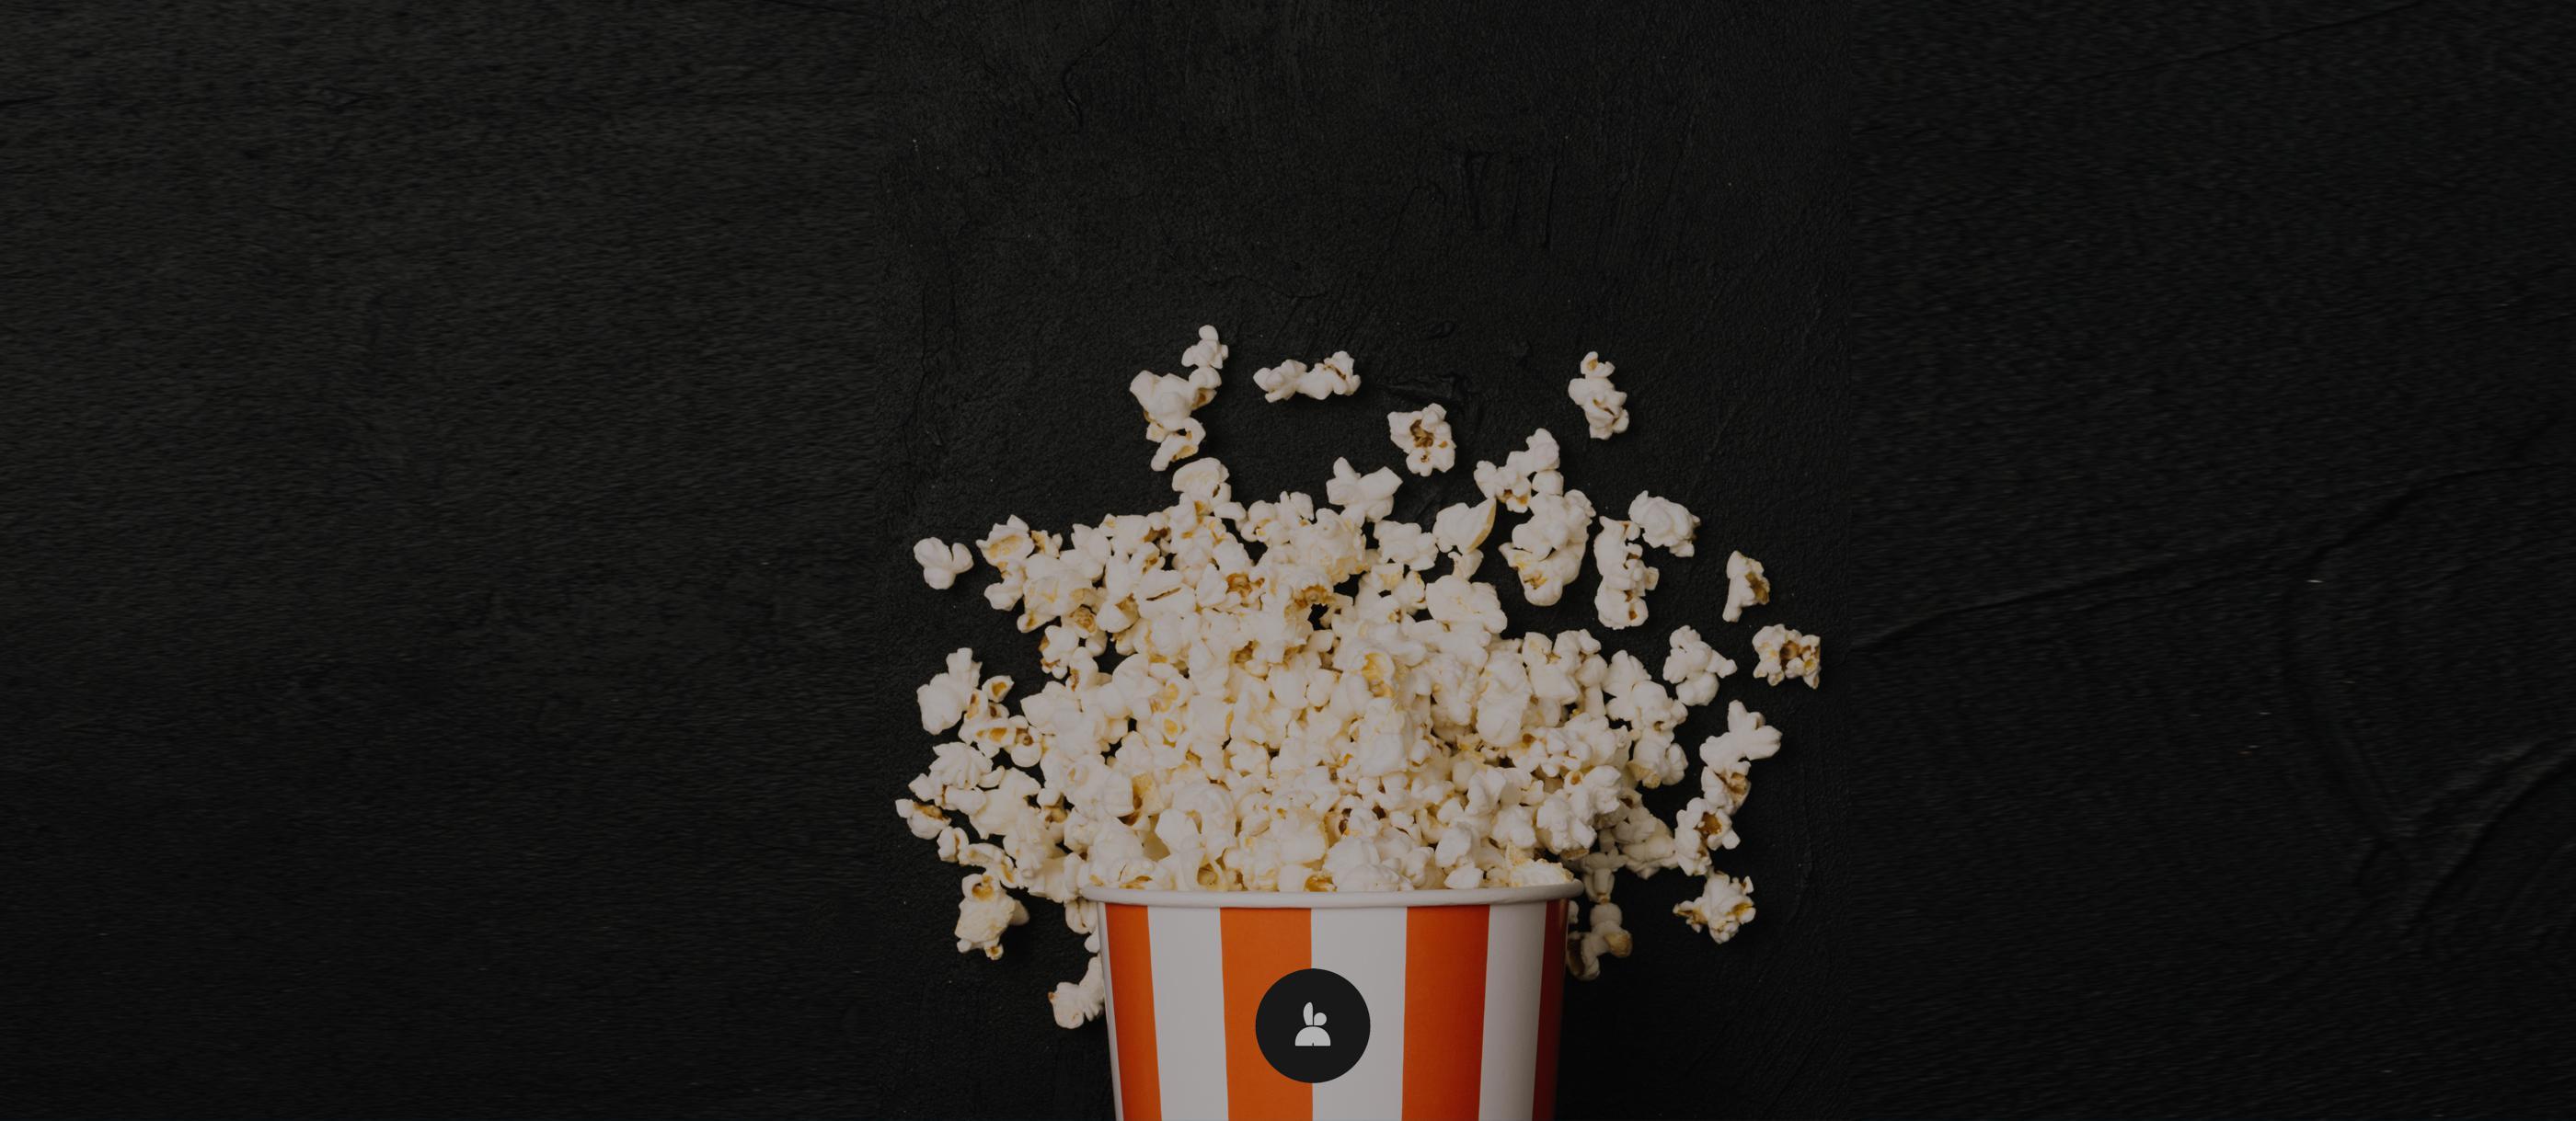 video-corporate-entreprise-cinema-lapinoalbino-production-video